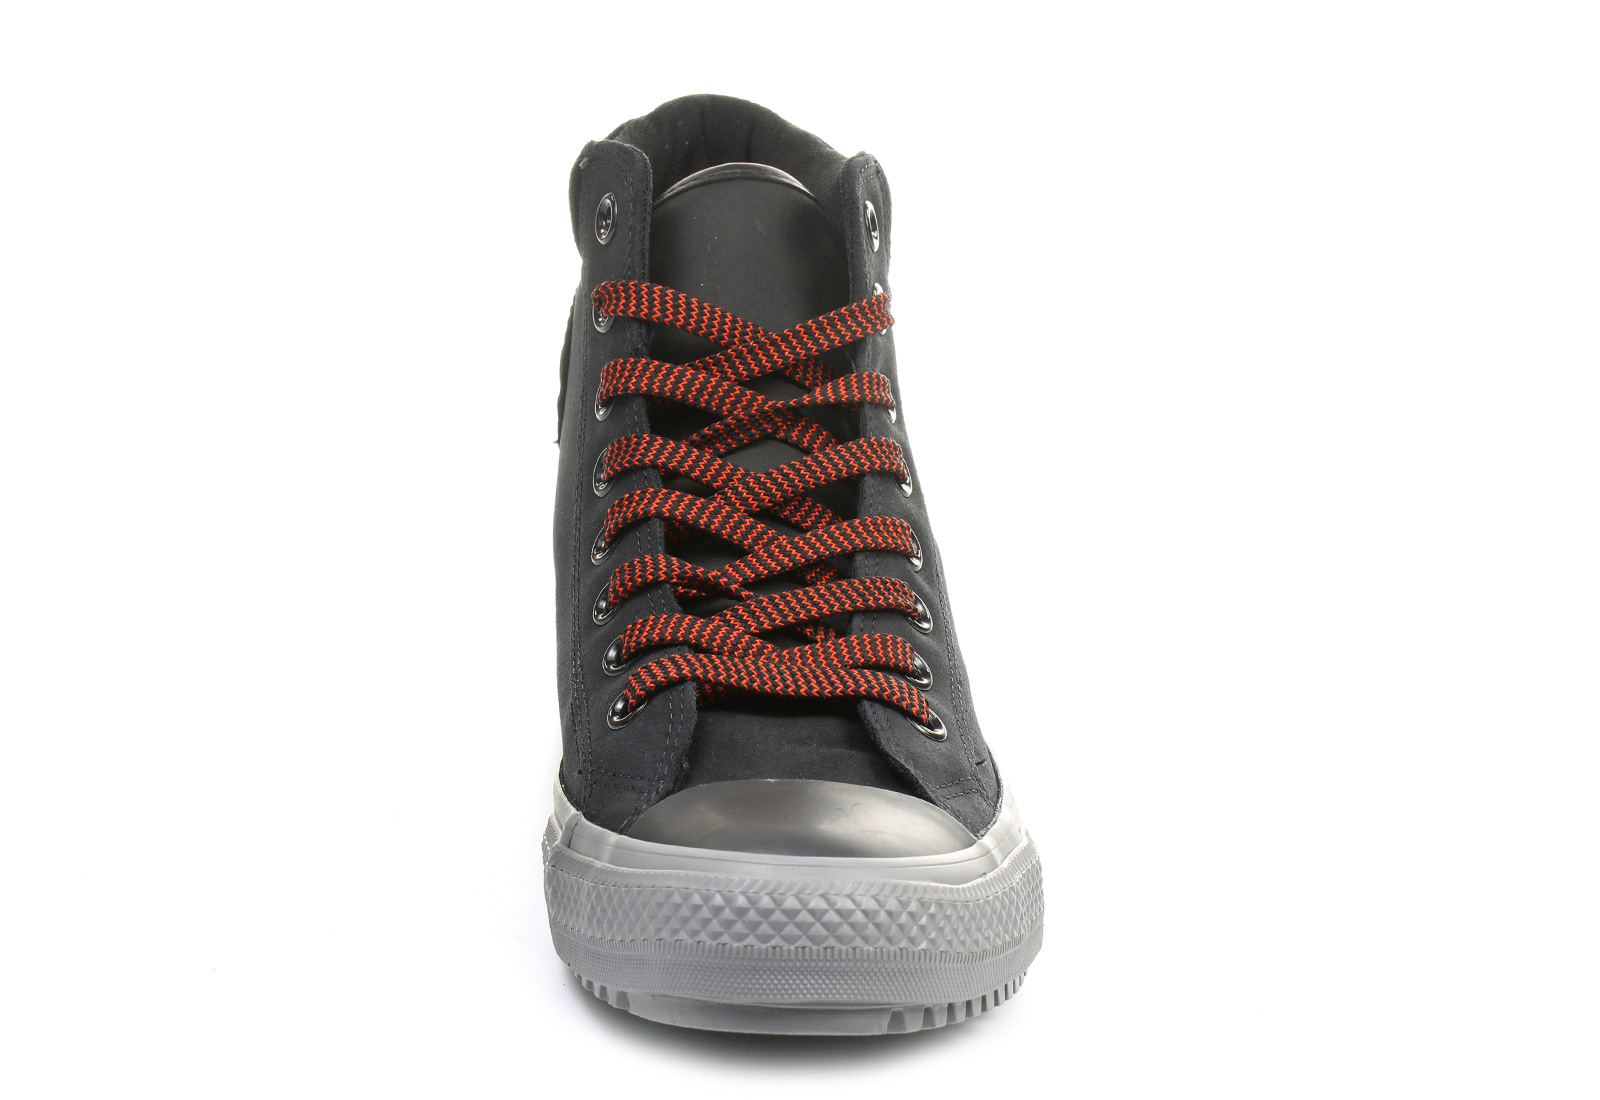 fe5d524dea8e Converse Tenisky - Chuck Taylor All Star Converse Boot Pc - 153672C ...